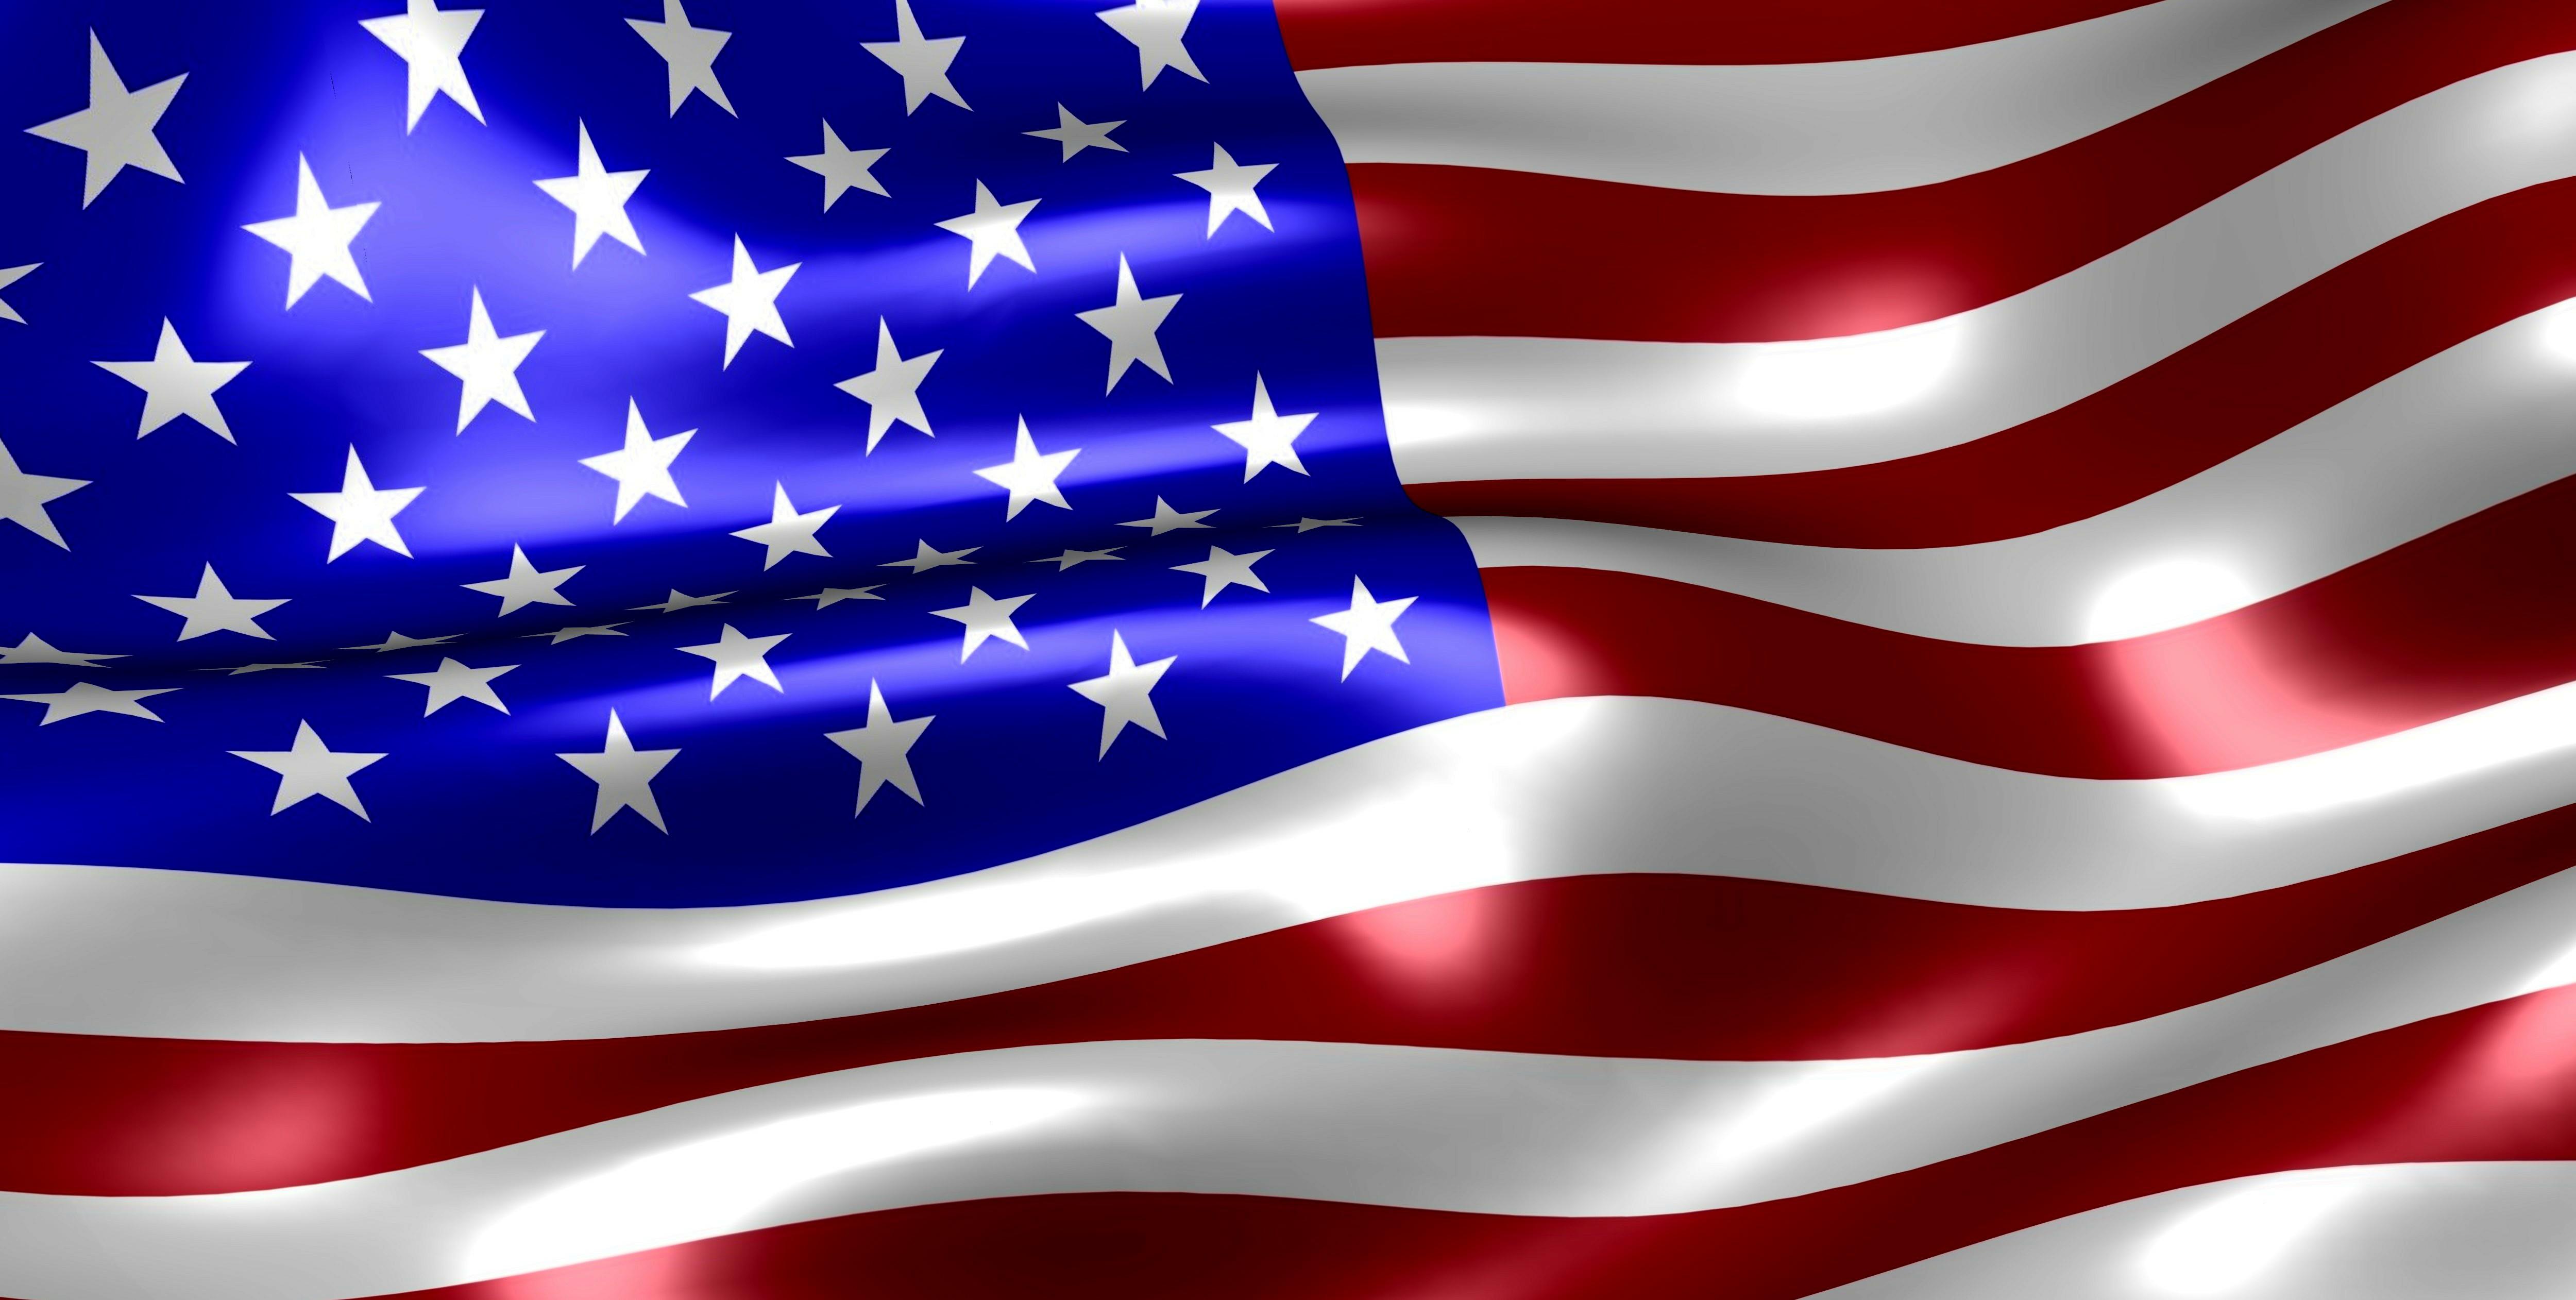 FileVisual of USA Flag stars and stripes FJM88NLjpg   Wikimedia 5000x2523